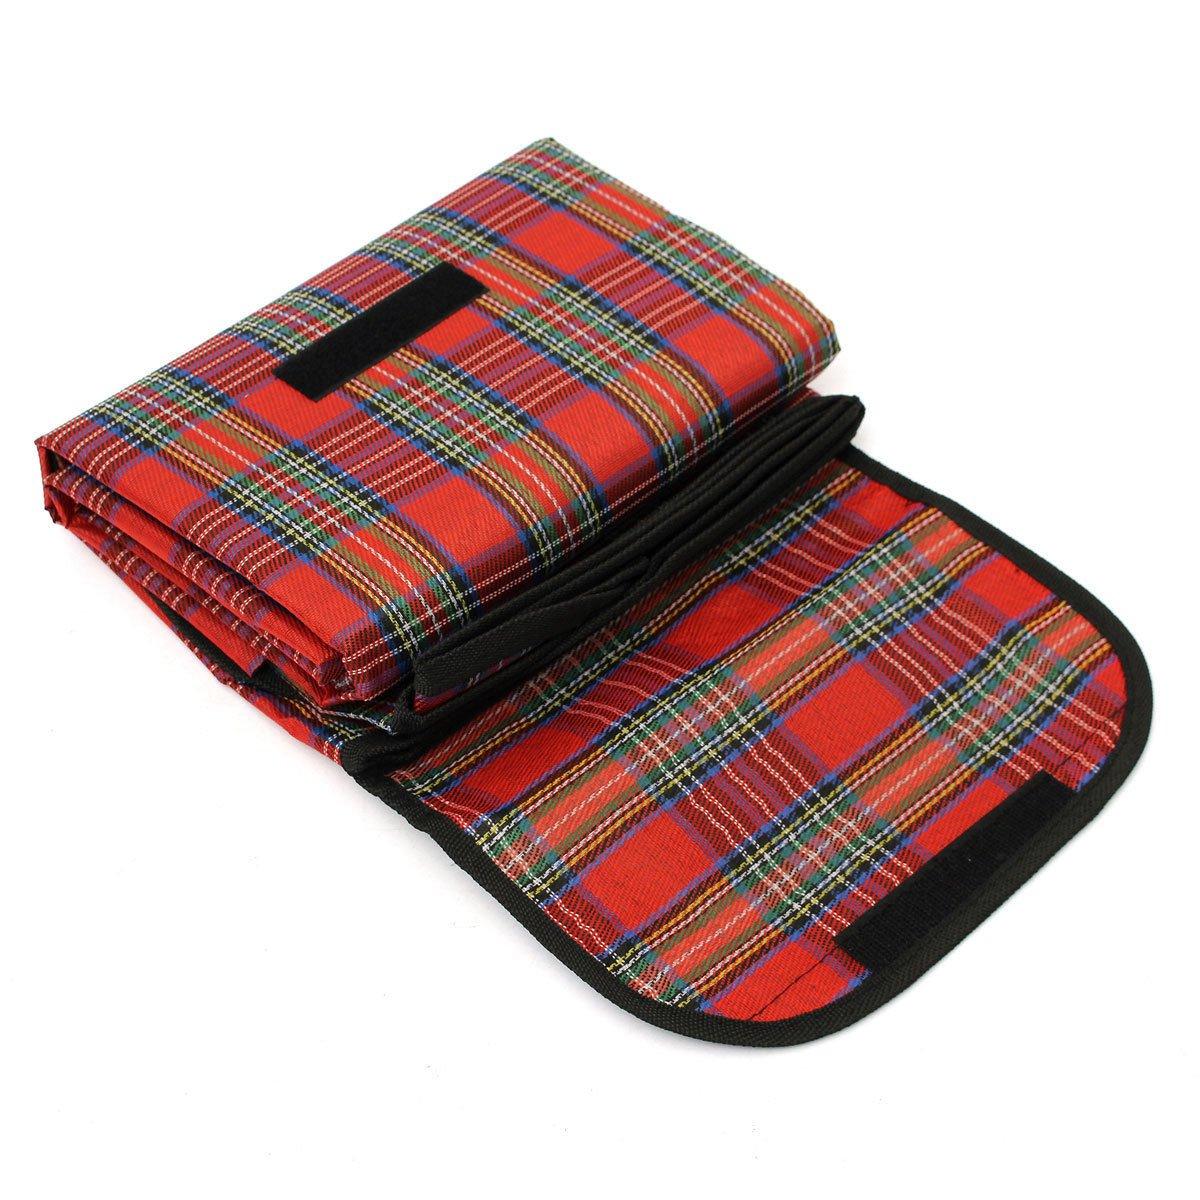 garden mile Large Compact Waterproof 150cm x 115cm Tartan Picnic Blanket Pet Blanket Machine Washable Festival, Camping, Car Blanket Ideal Travel Rug (Red) Garden mile®